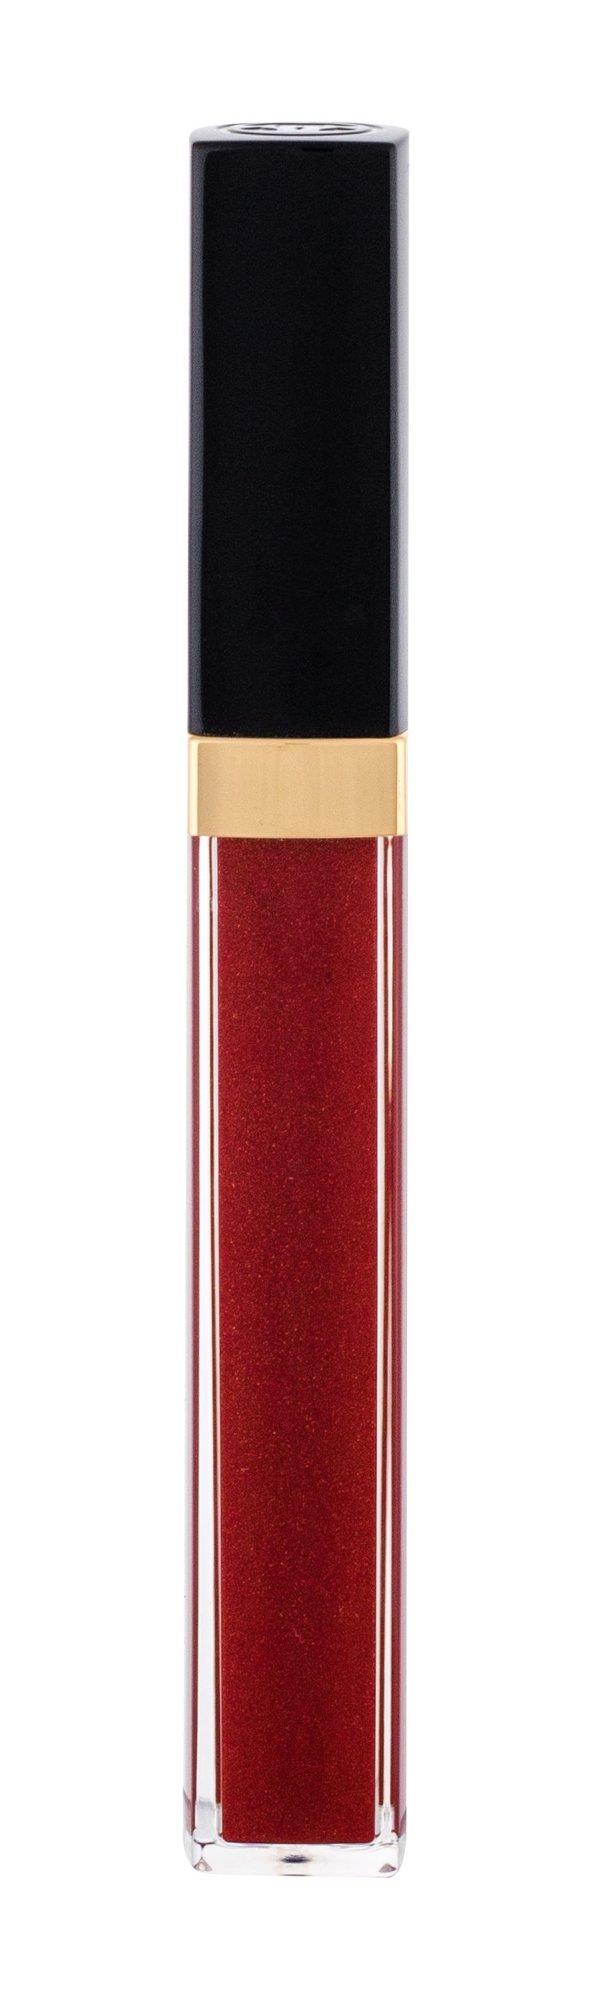 Chanel Rouge Coco Lip Gloss 5,5ml 754 Opulence